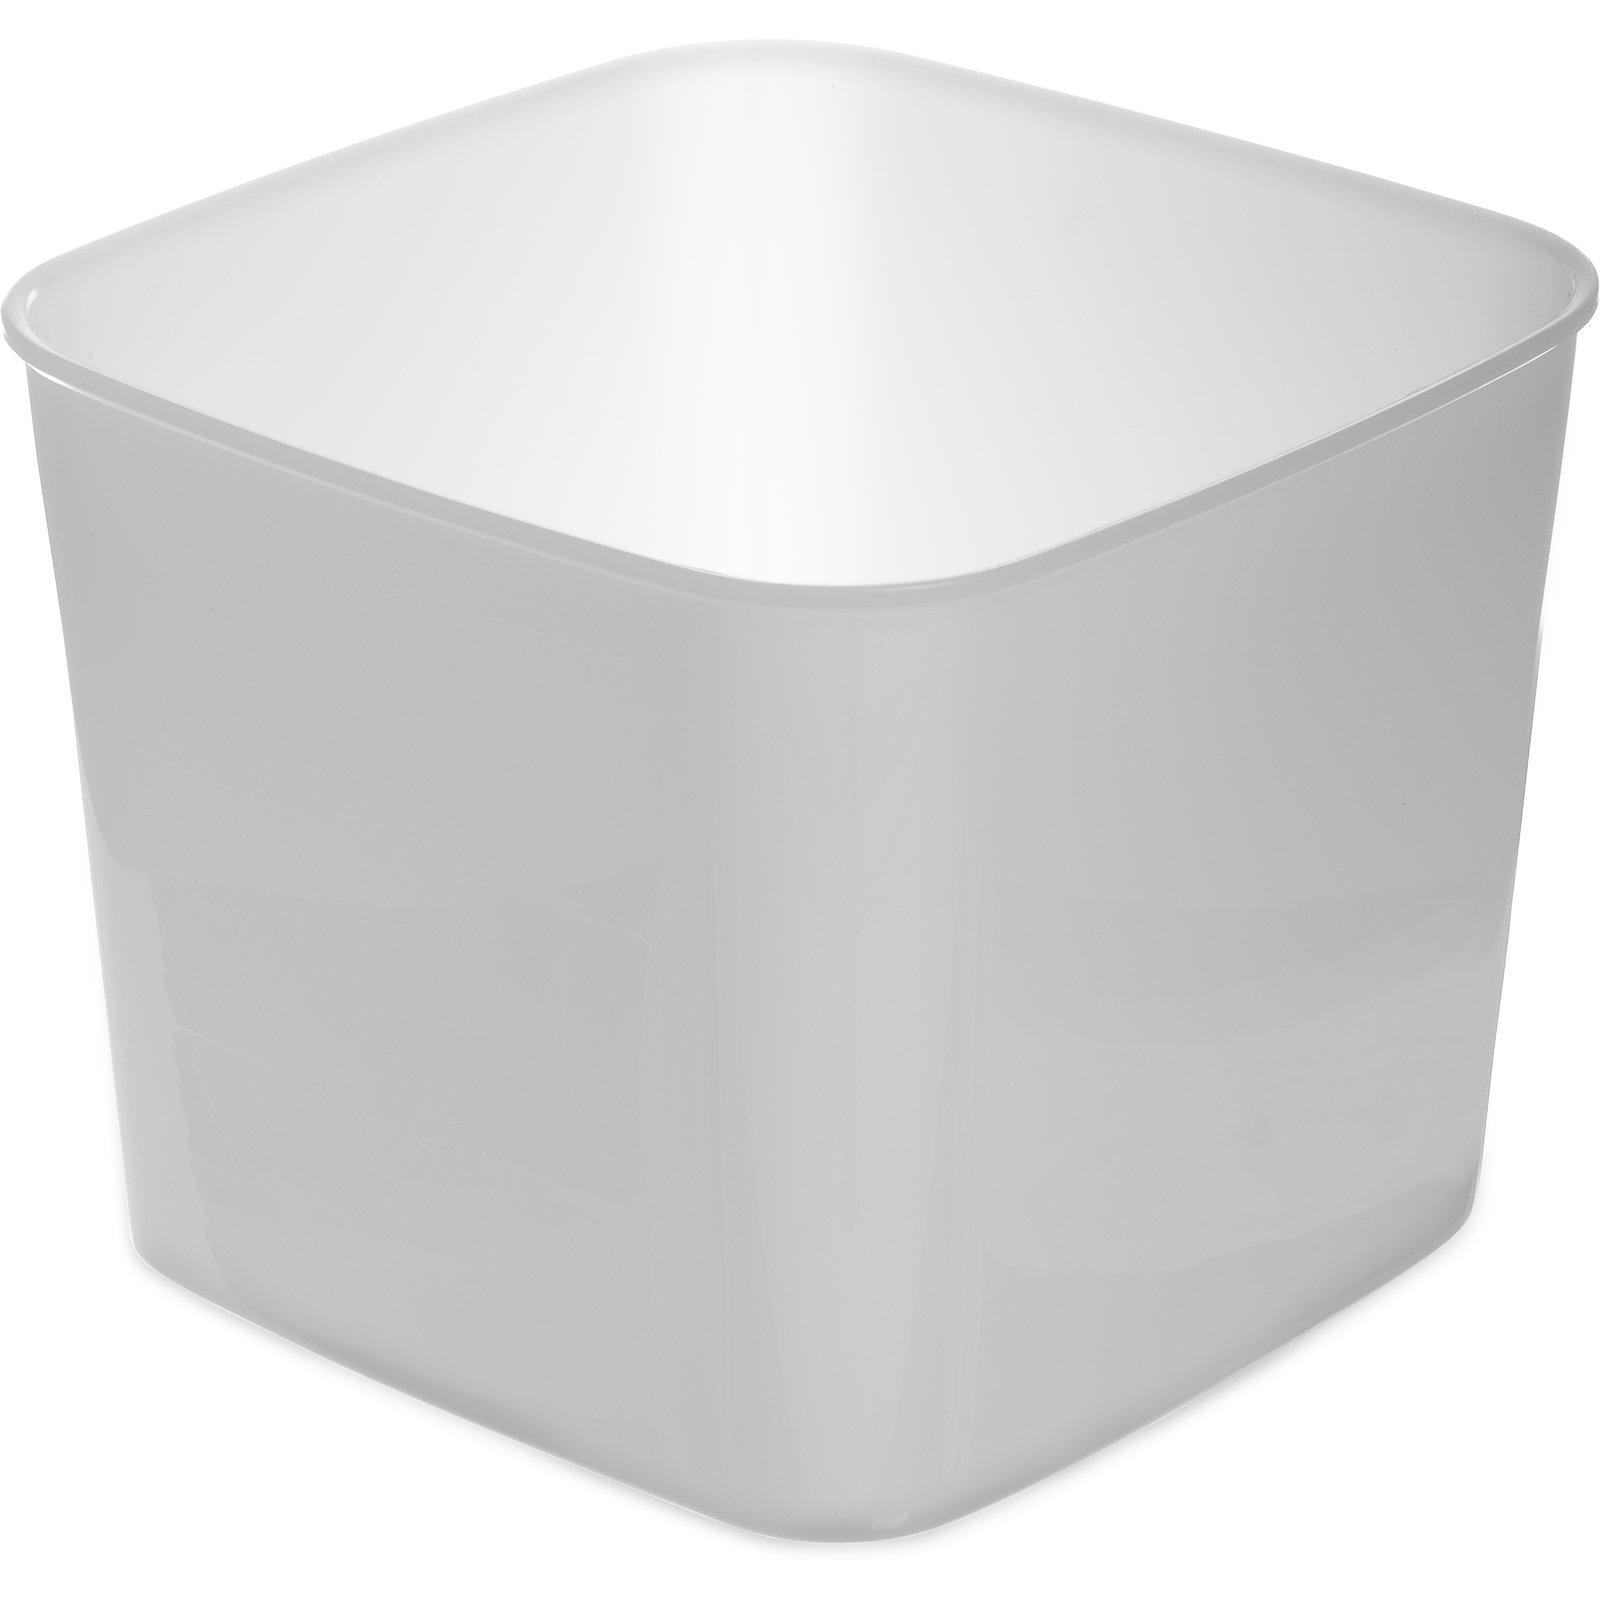 155602 StorPlus Storage Container 6 qt White Carlisle